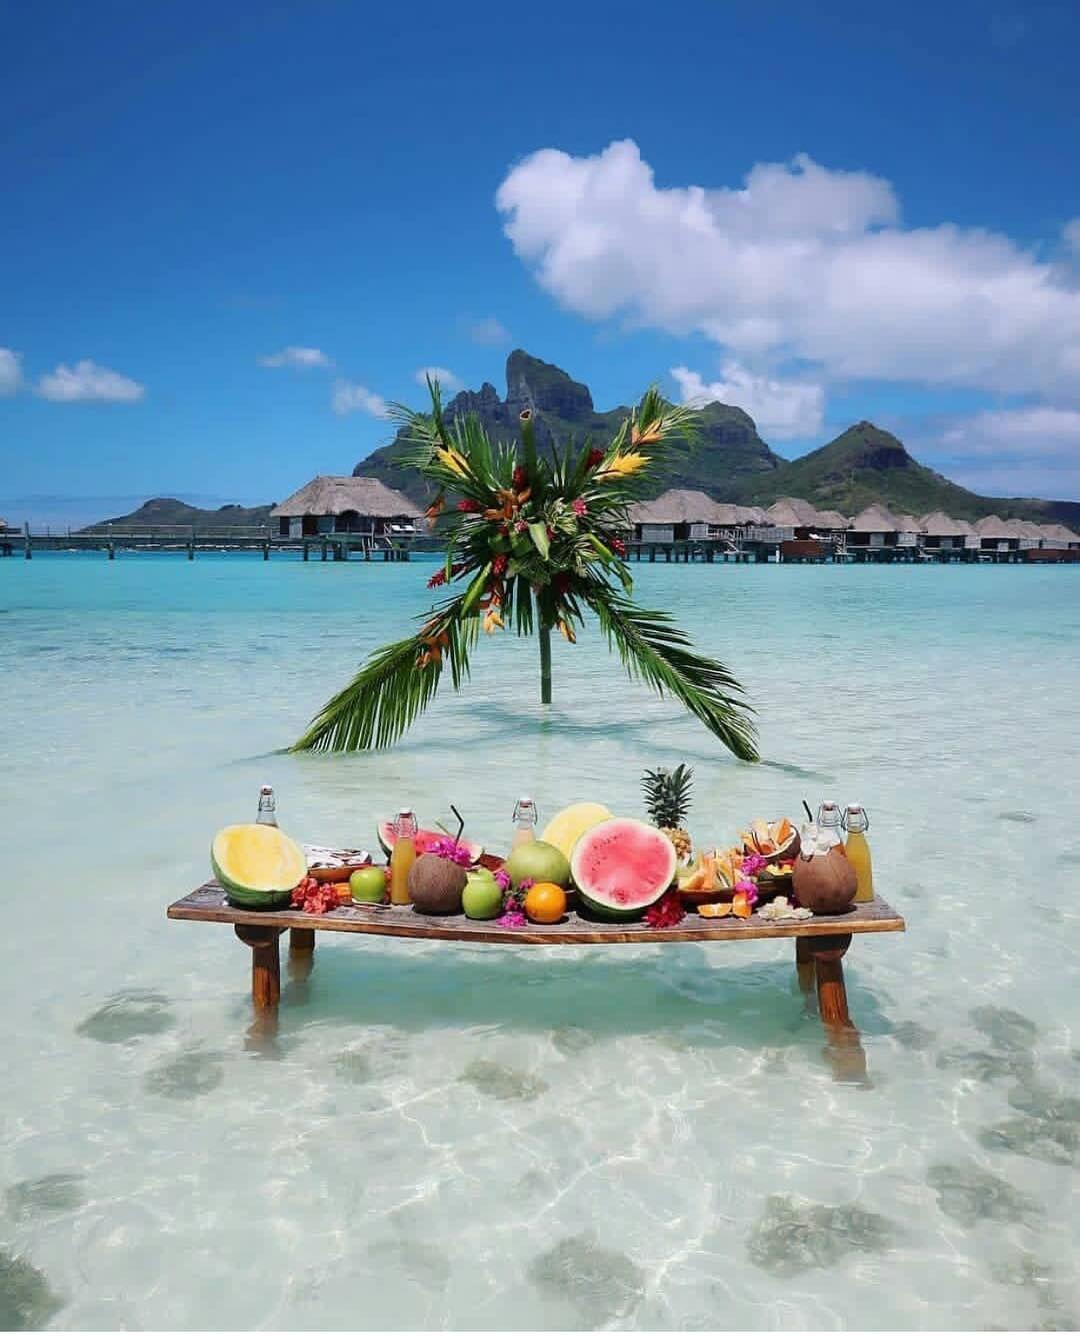 Fancy A Breakfast Bora Bora French Polynesia Picture By Thehotelhunters Wonderful Pla Bora Bora French Polynesia Wonderful Places Bora Bora